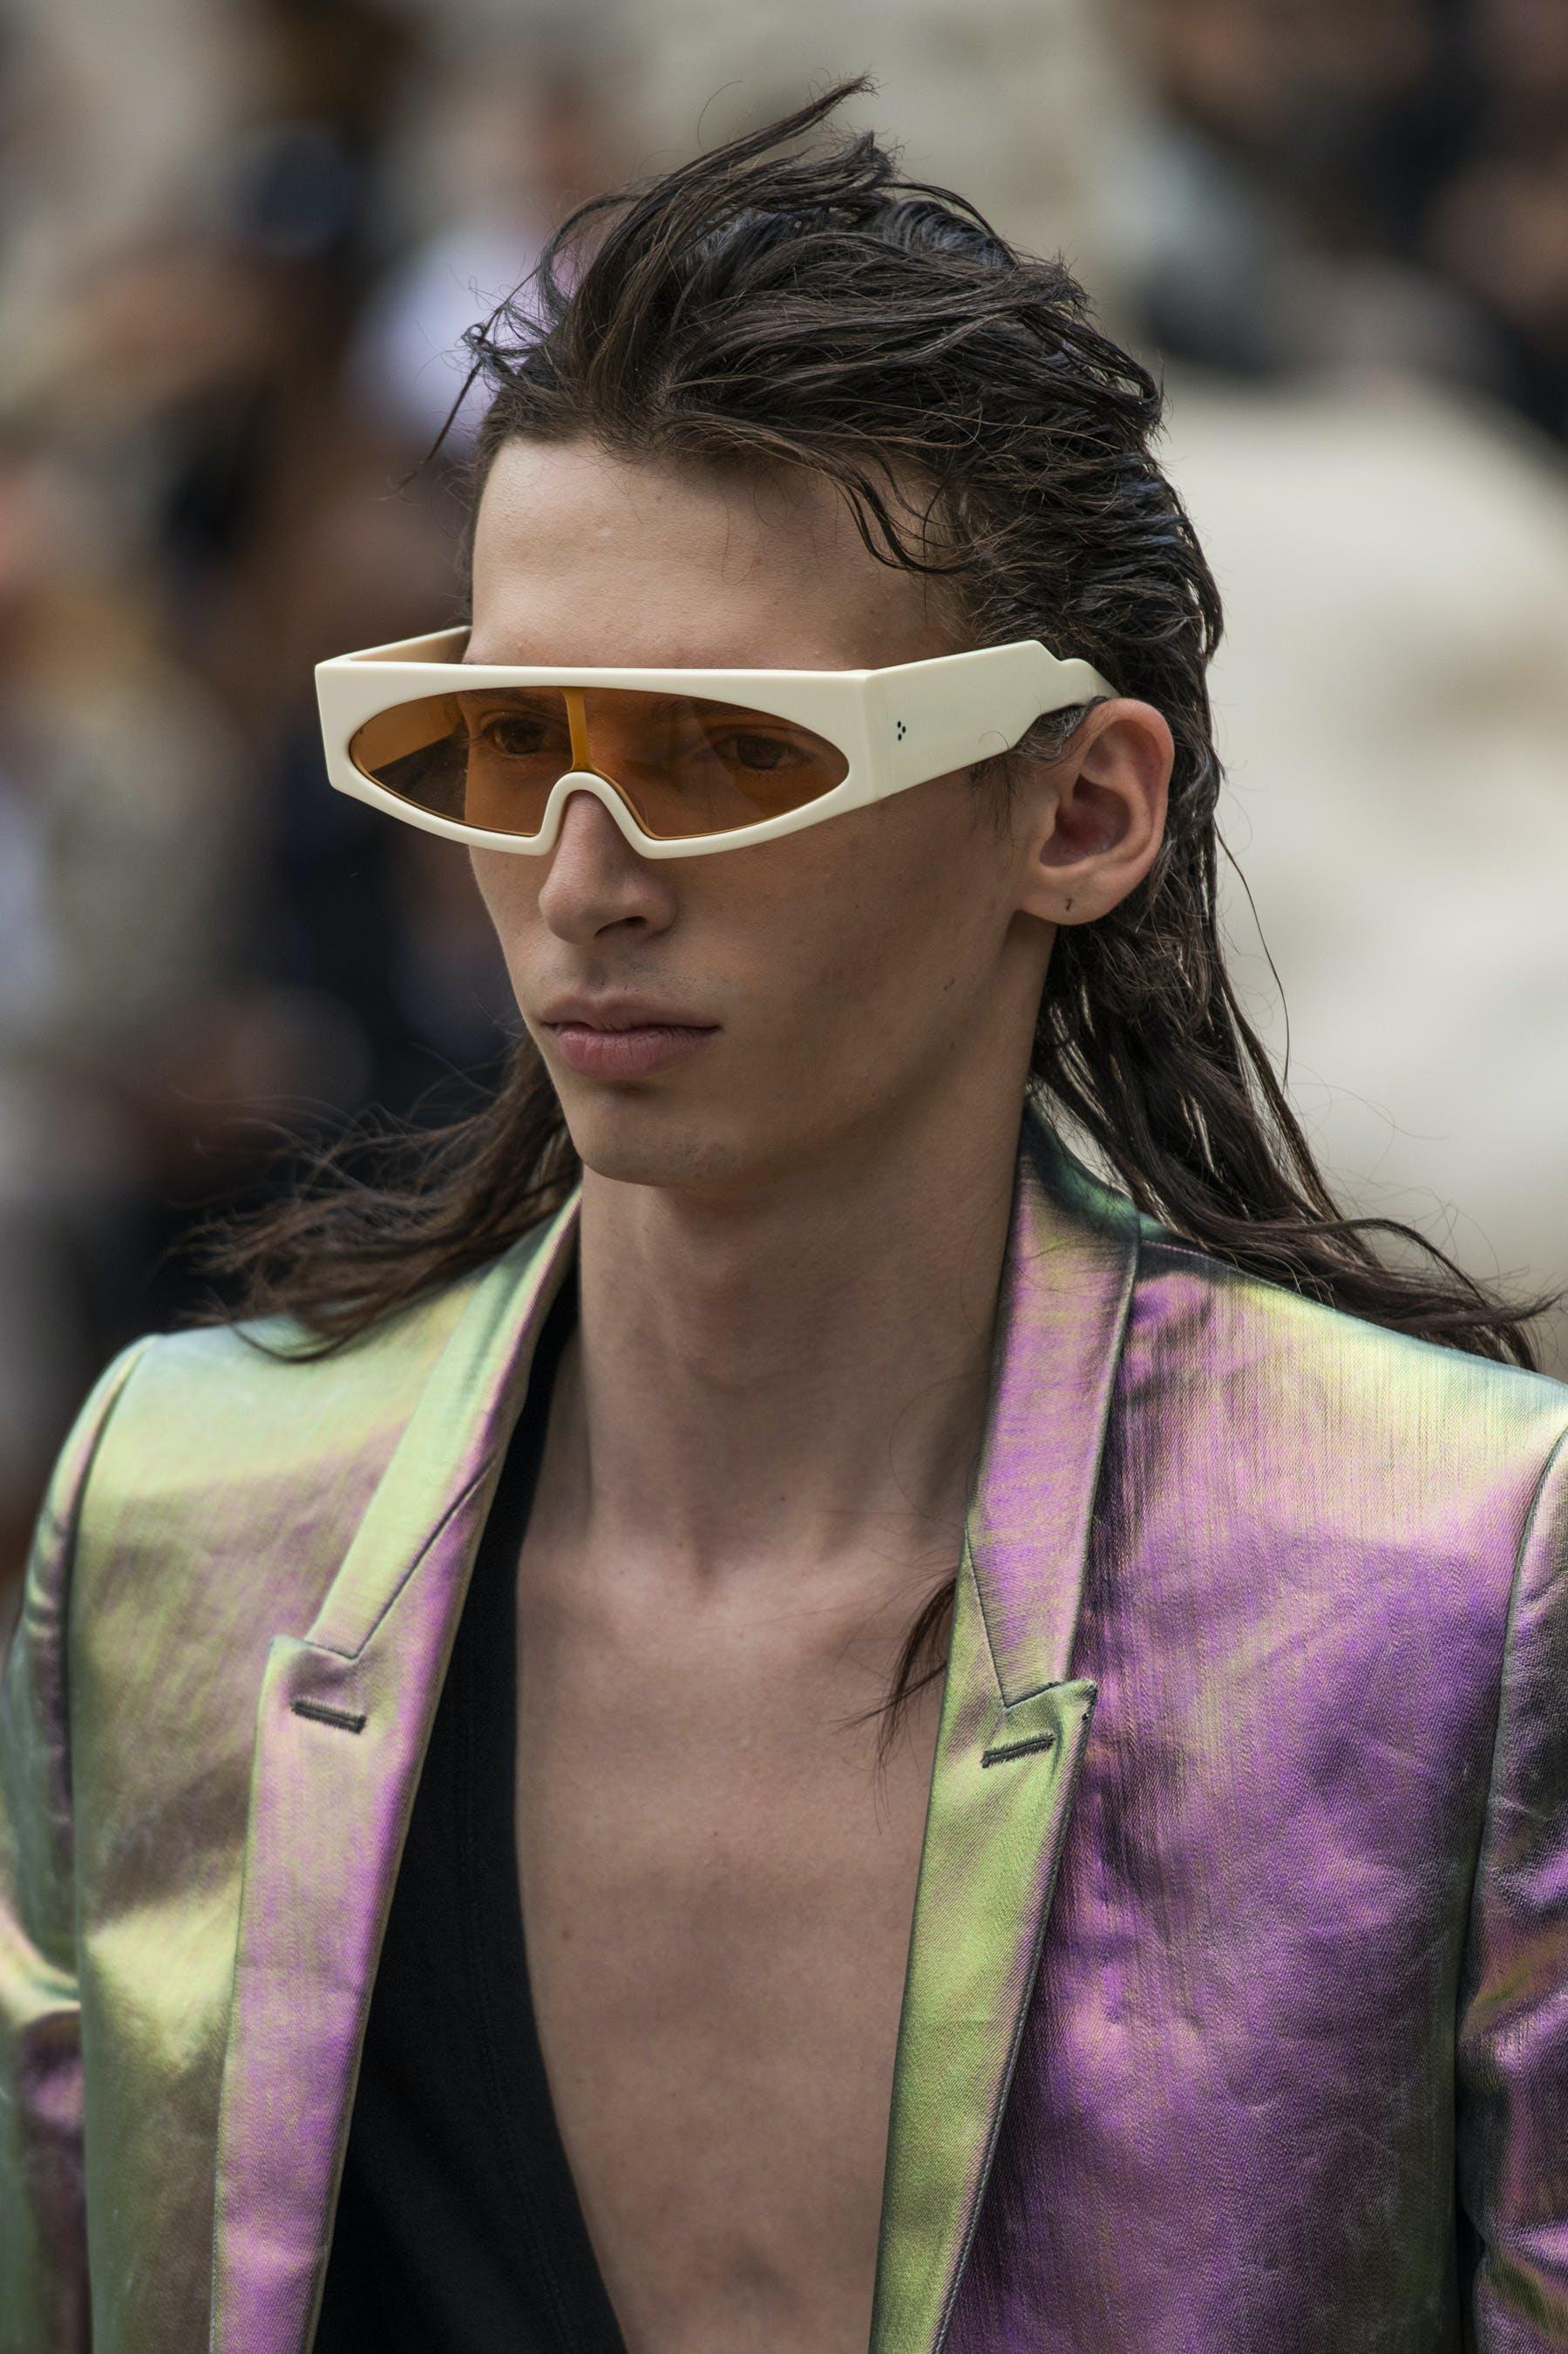 Rick Owens Runway Details Retro Futuristic White Rectangular Framed Sunglasses Tatlin Blazer In Iridescent Lemon Yellow Mens SS20 Tecautl